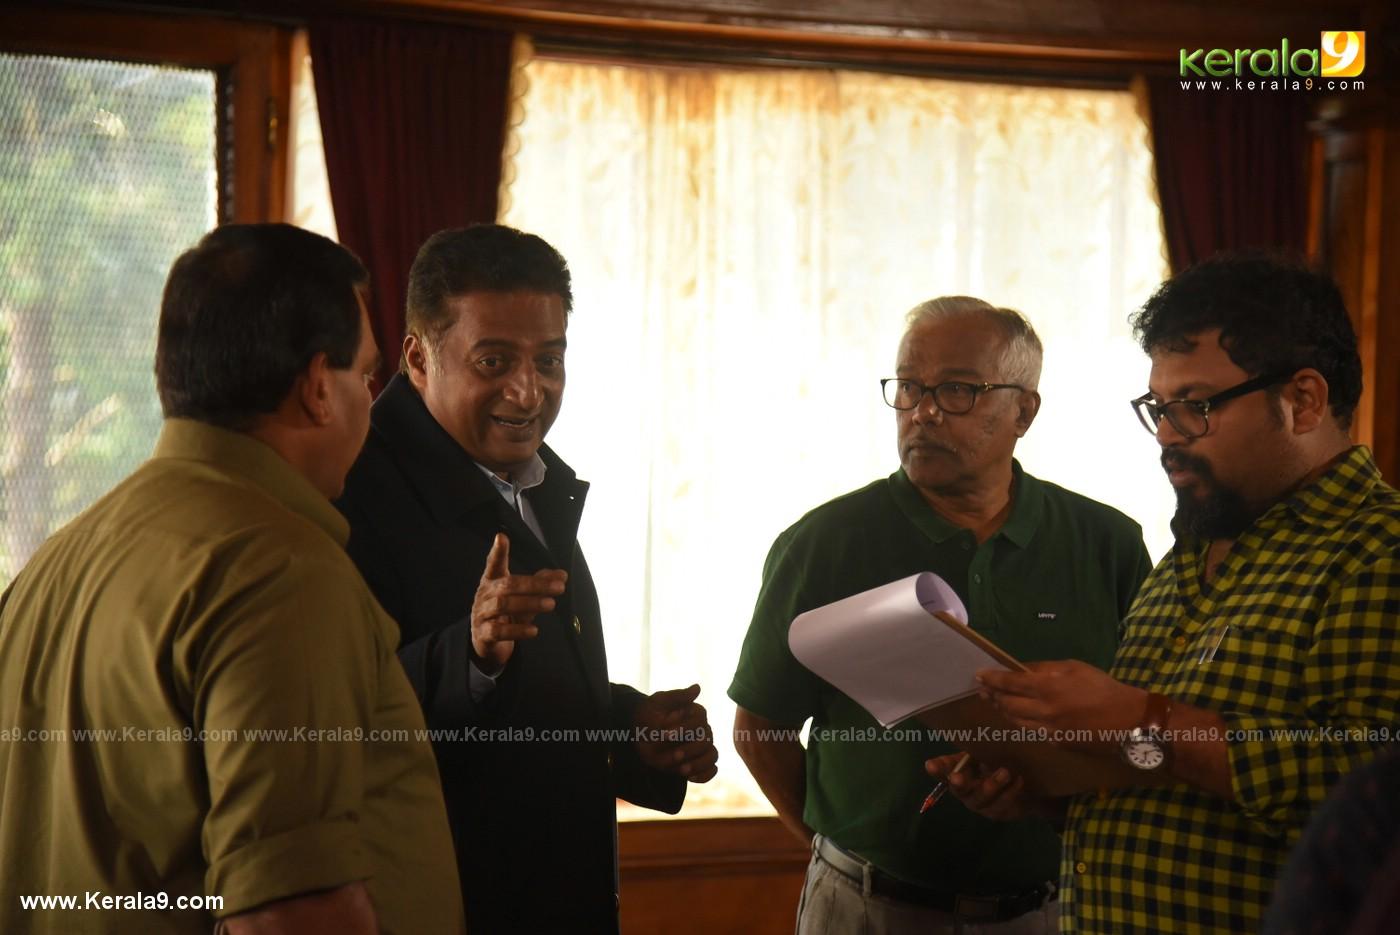 athiran malayalam movie stills - Kerala9.com